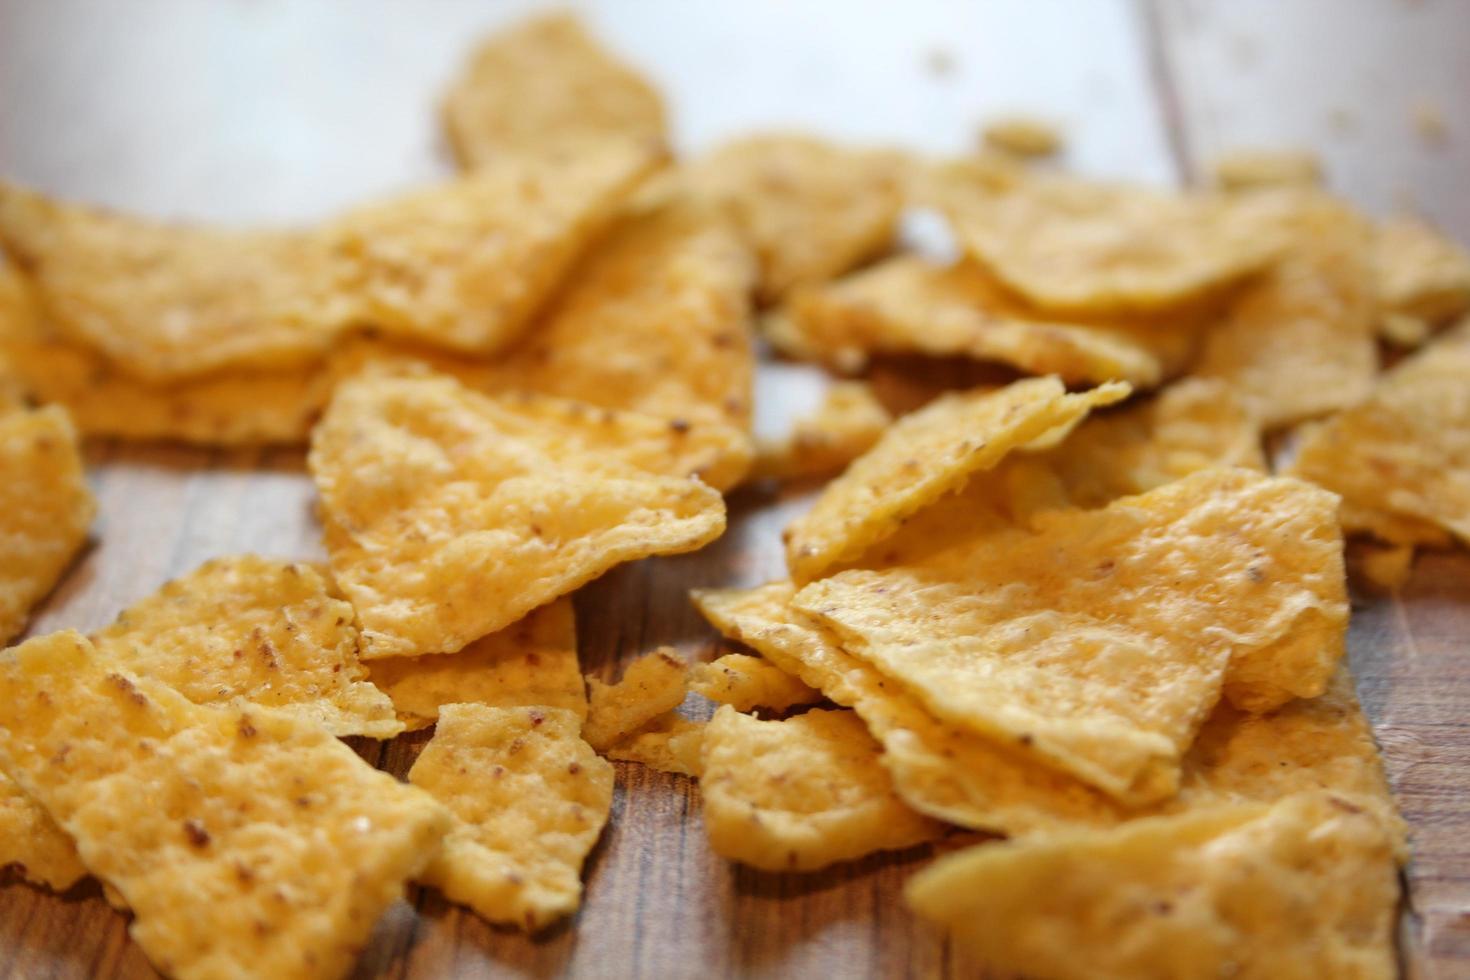 Crunchy broken chips photo